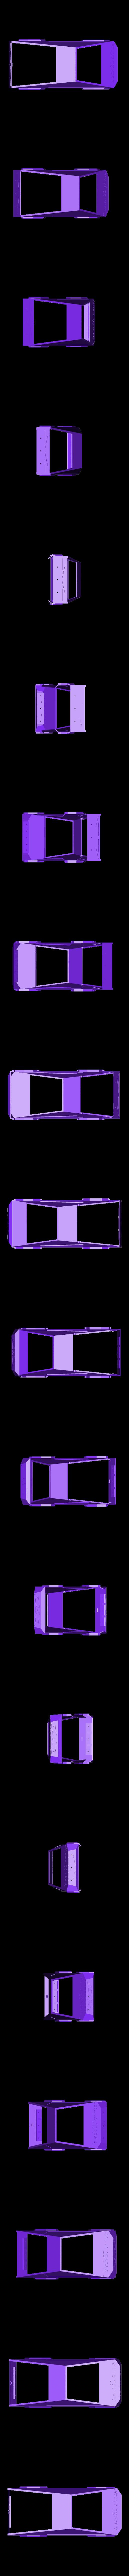 case.STL Download free STL file RC car Cybertruck • 3D printing object, TB3D